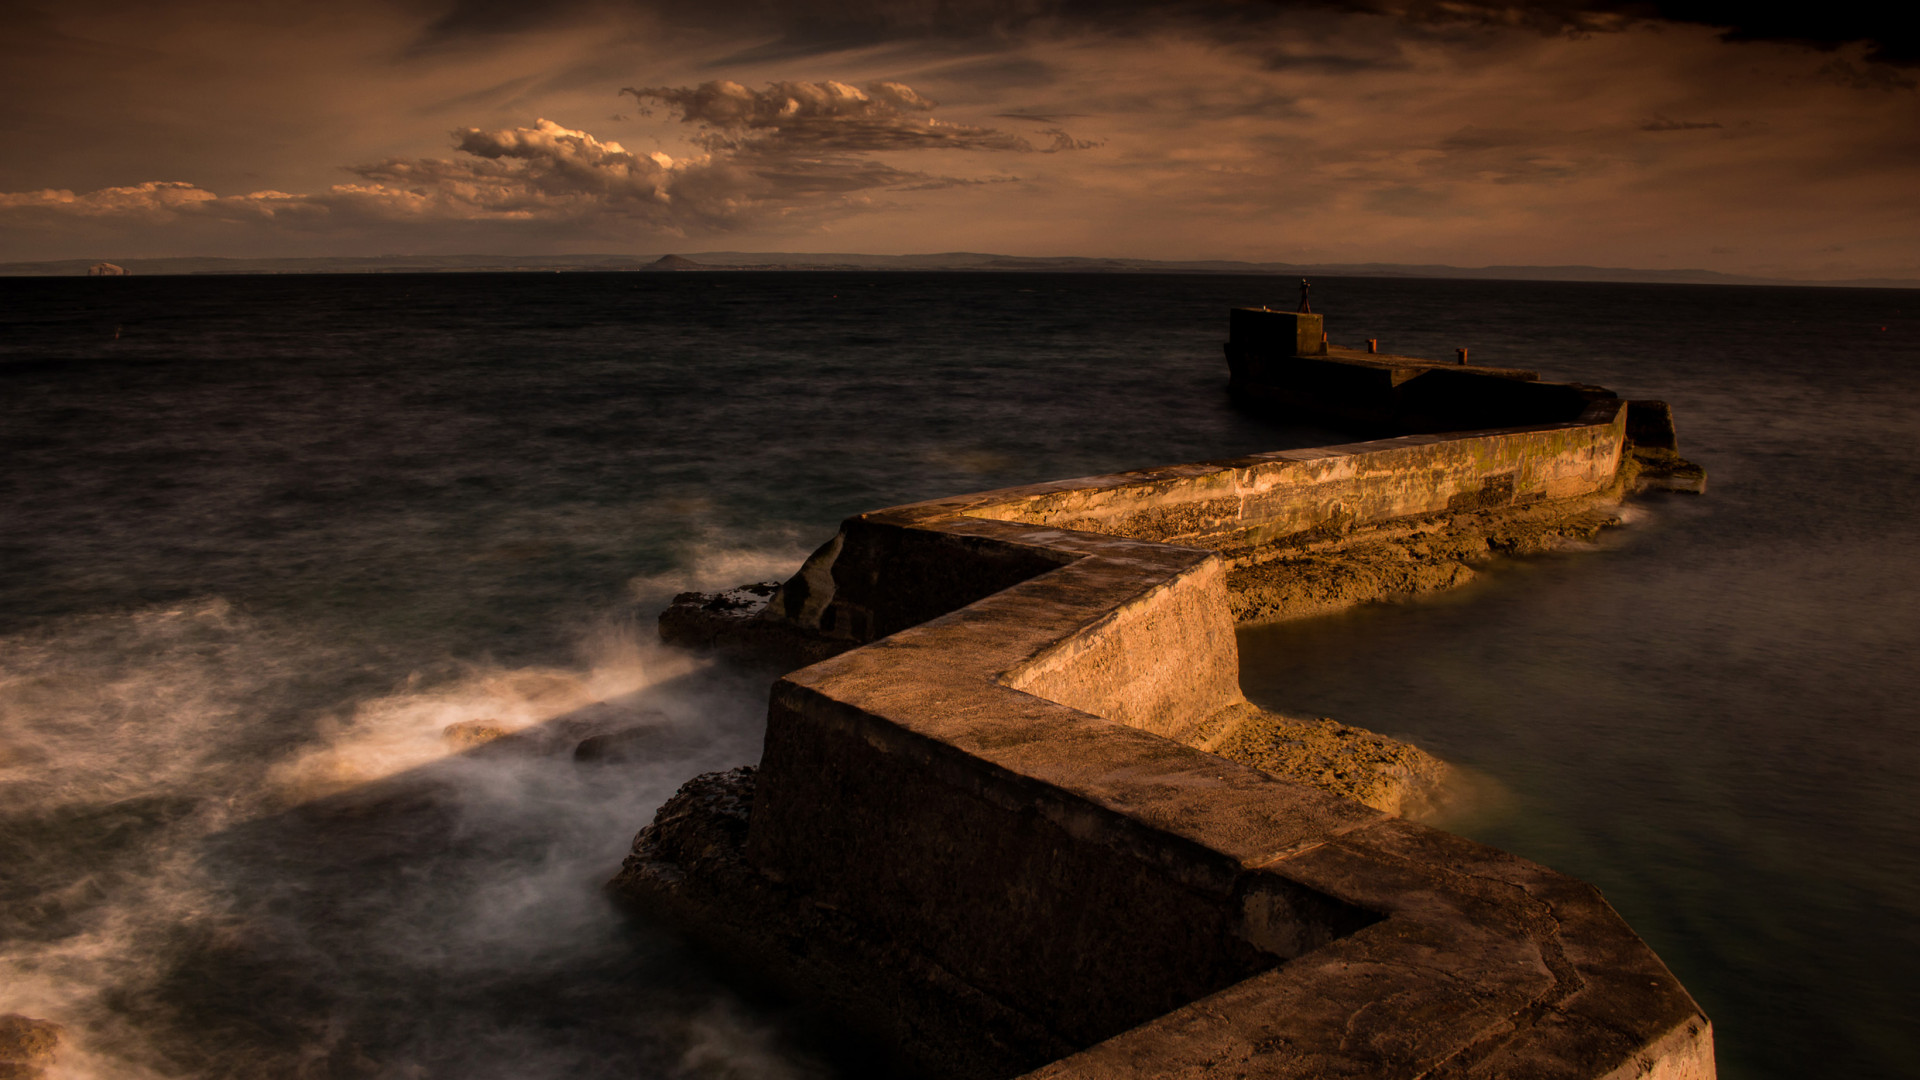 Late evening sun at St Monans Breakwater, Fife